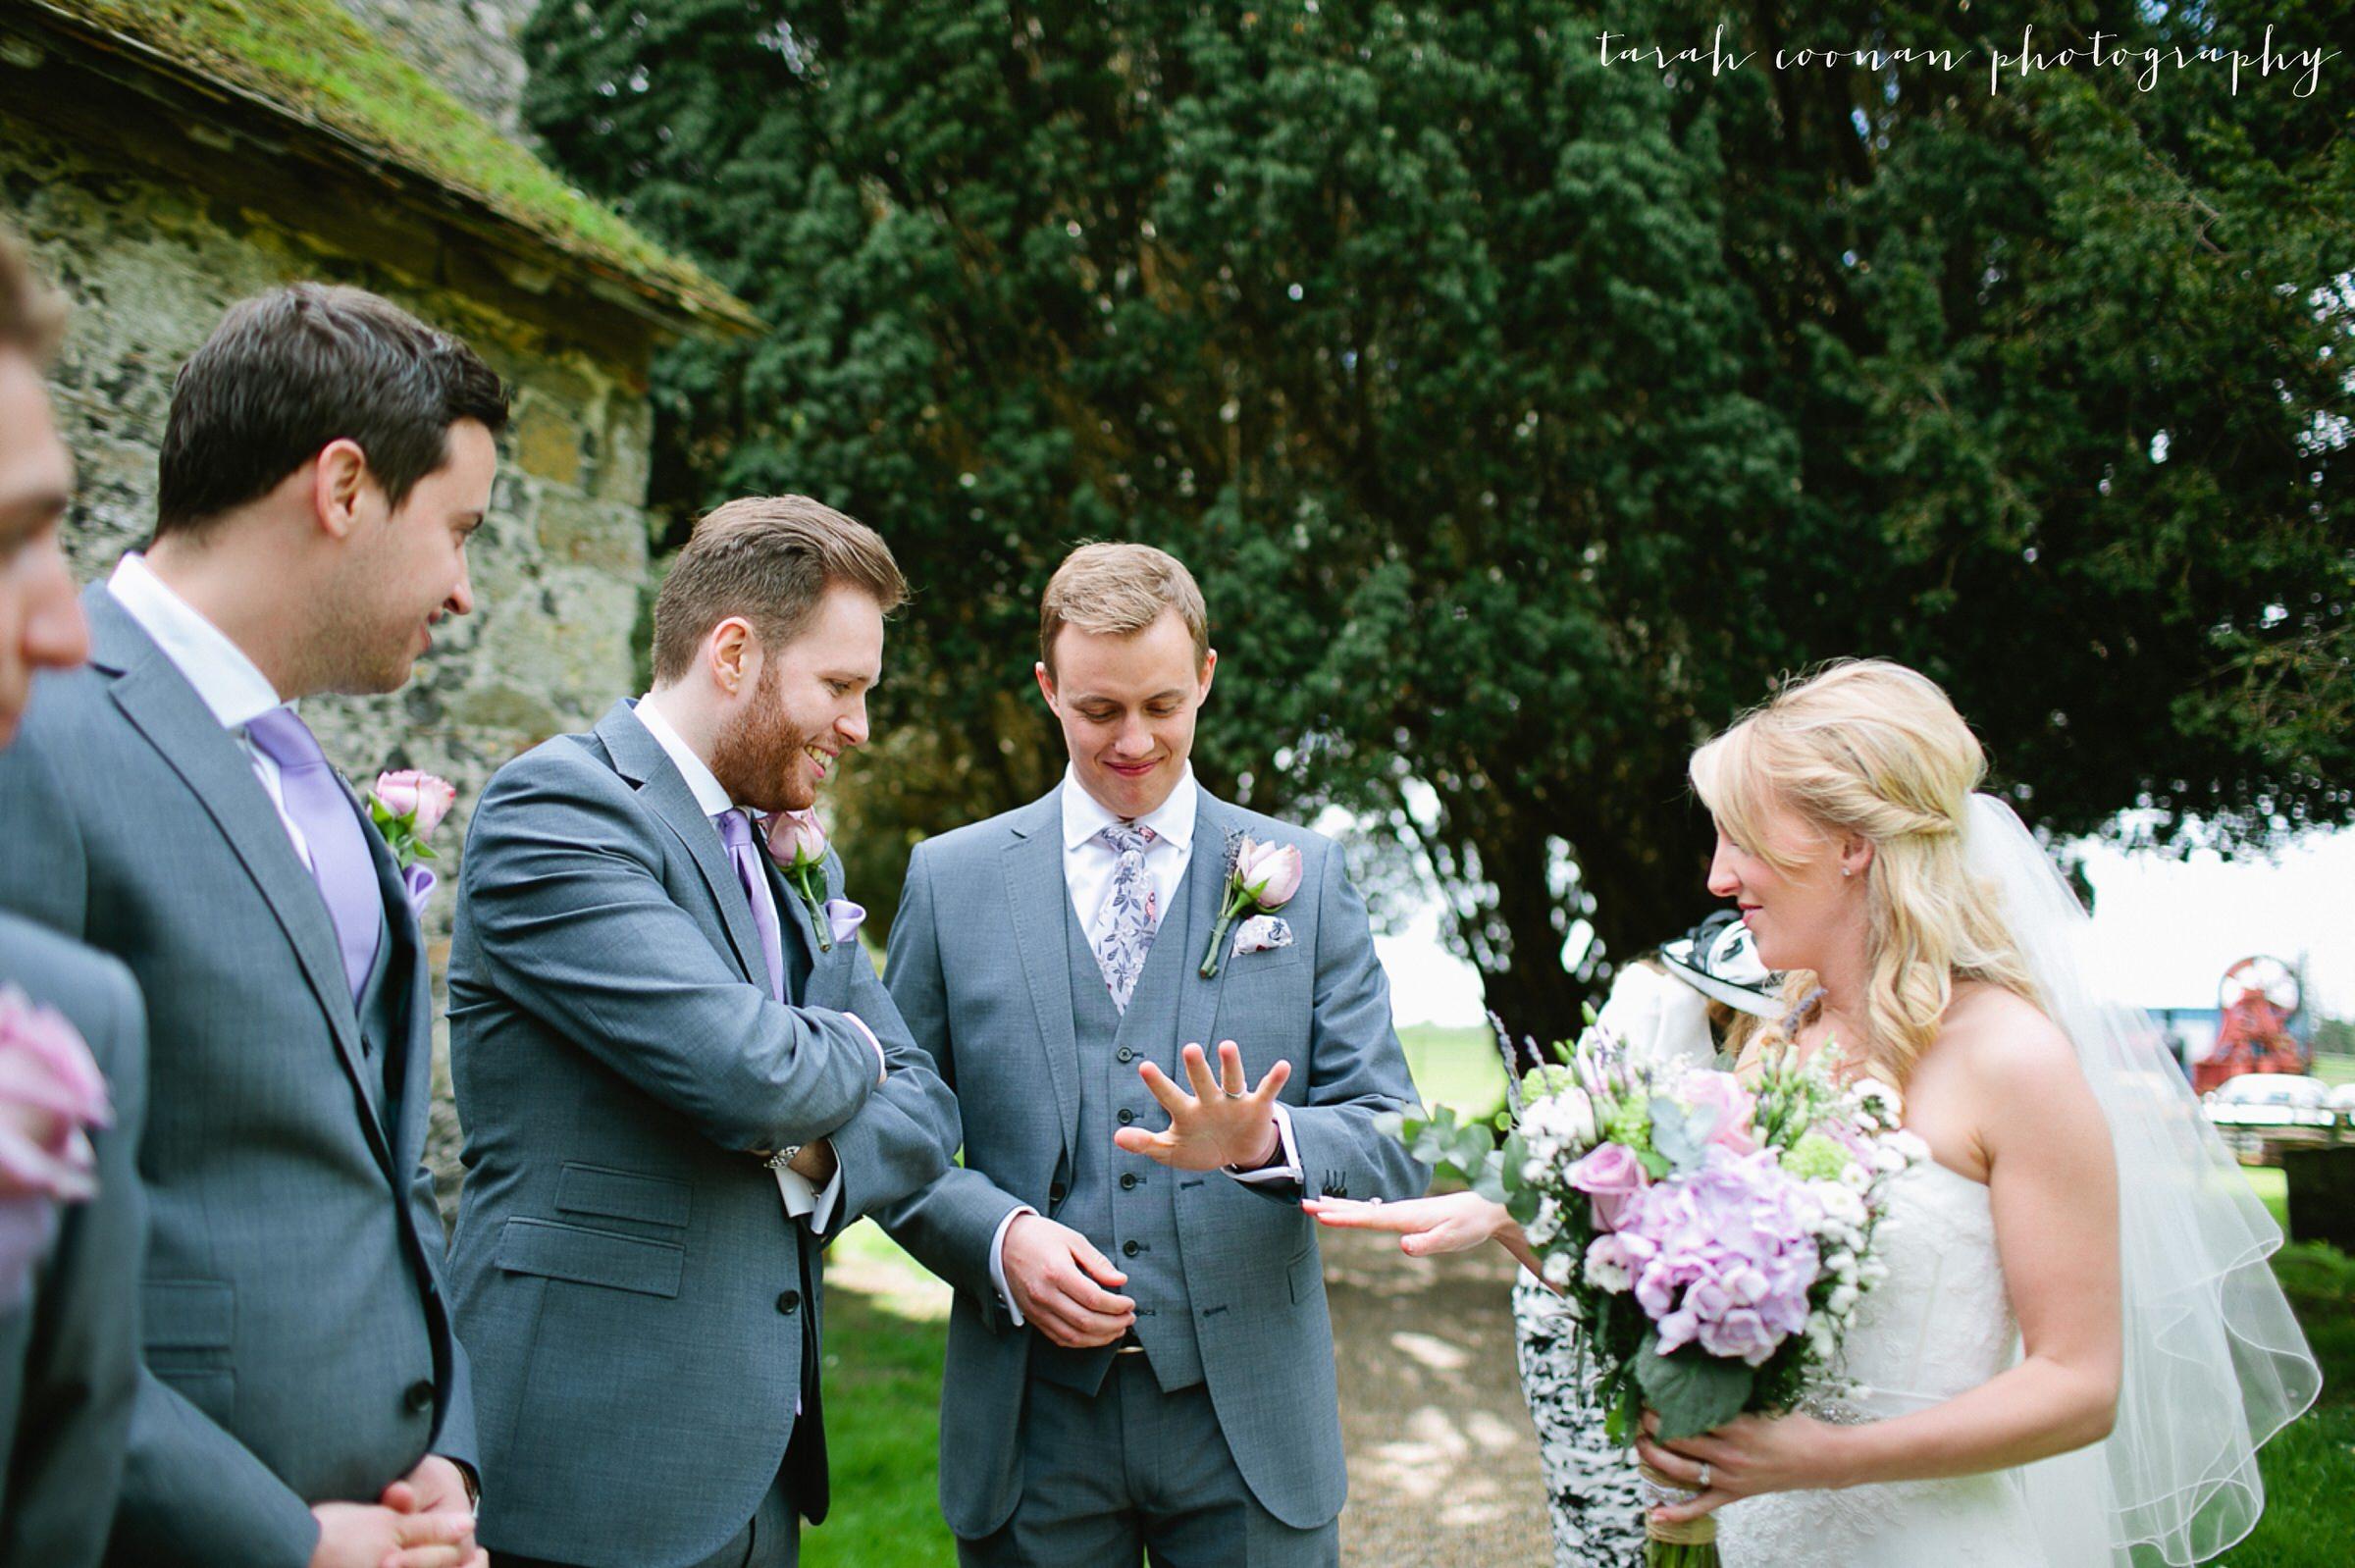 brighton-wedding-photographer36